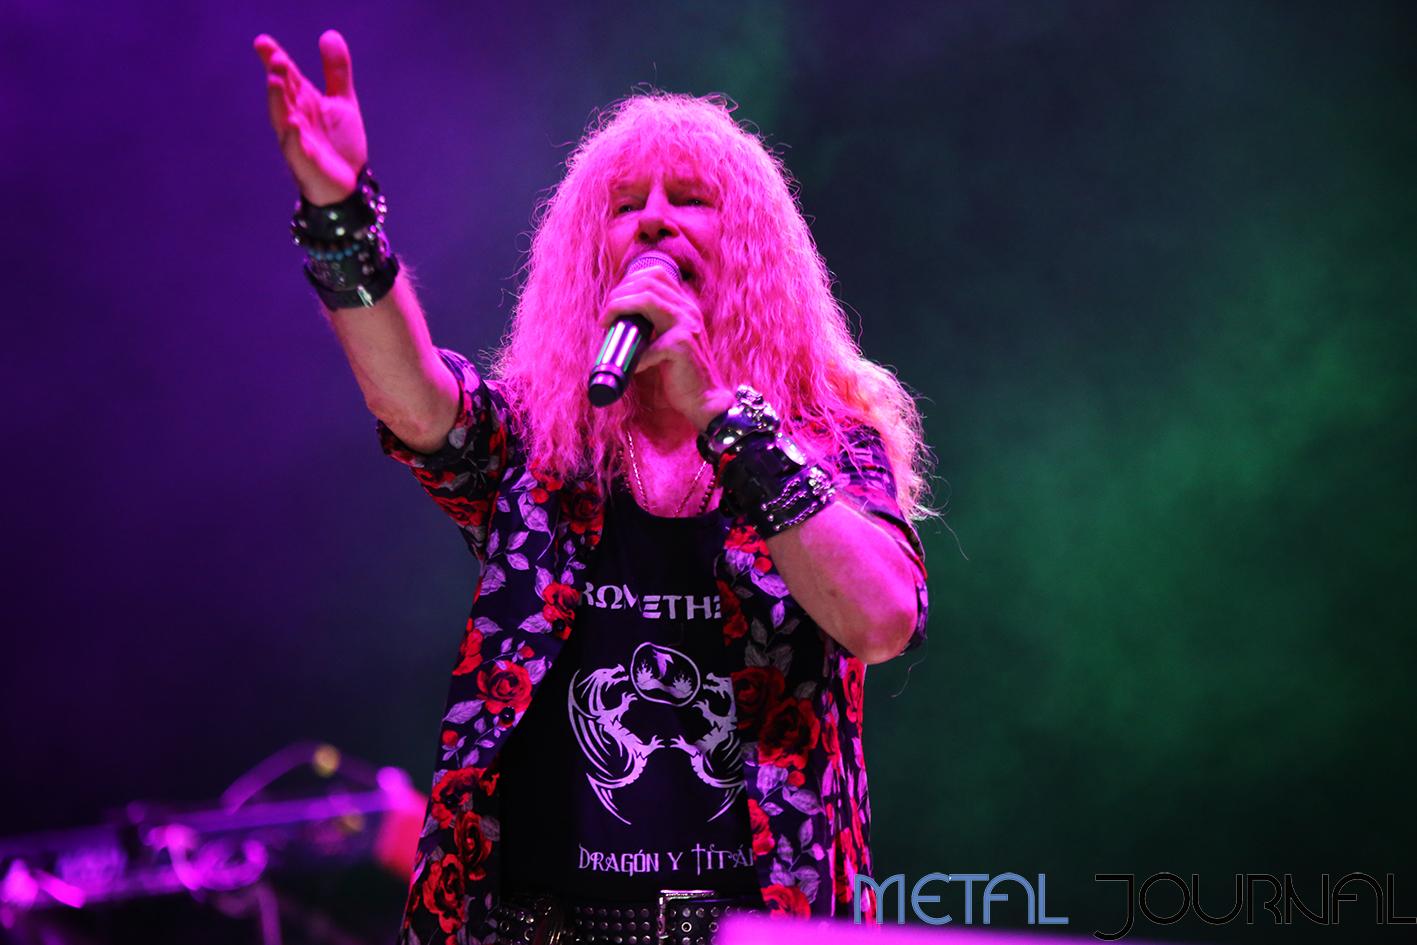 medina azahara - leyendas del rock 2019 metal journal pic 2